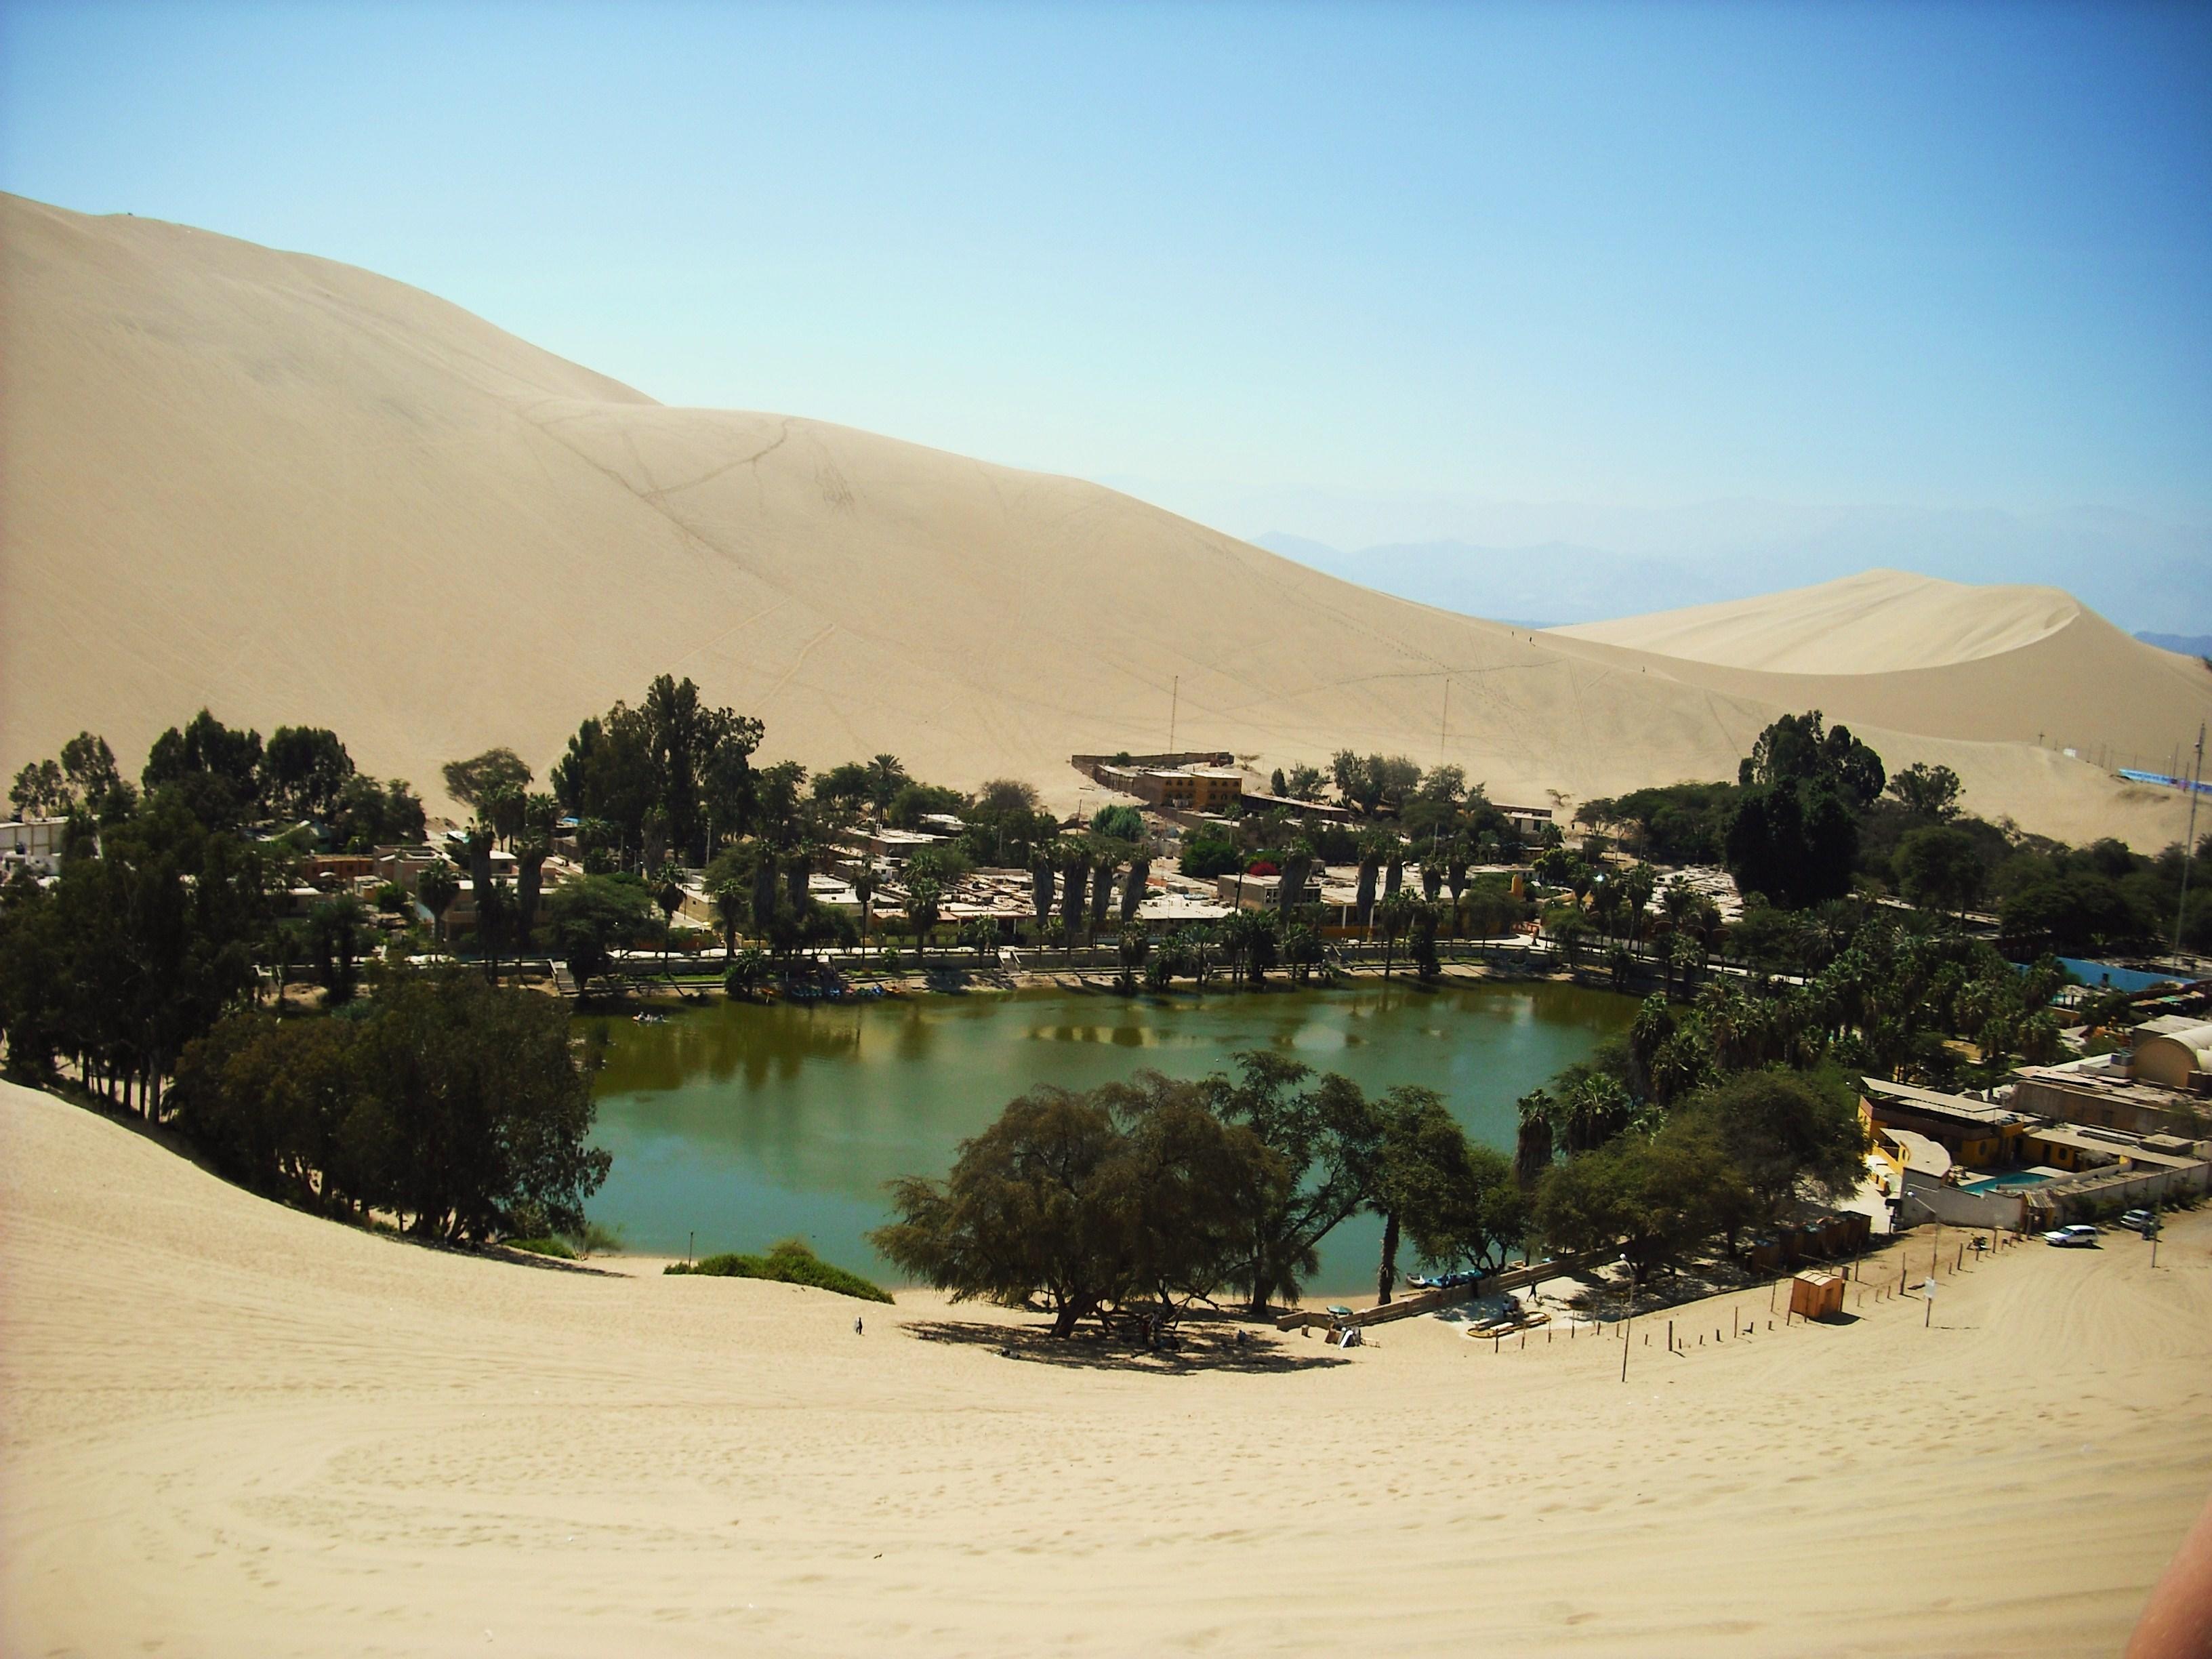 Oasis_Huacachina.JPG